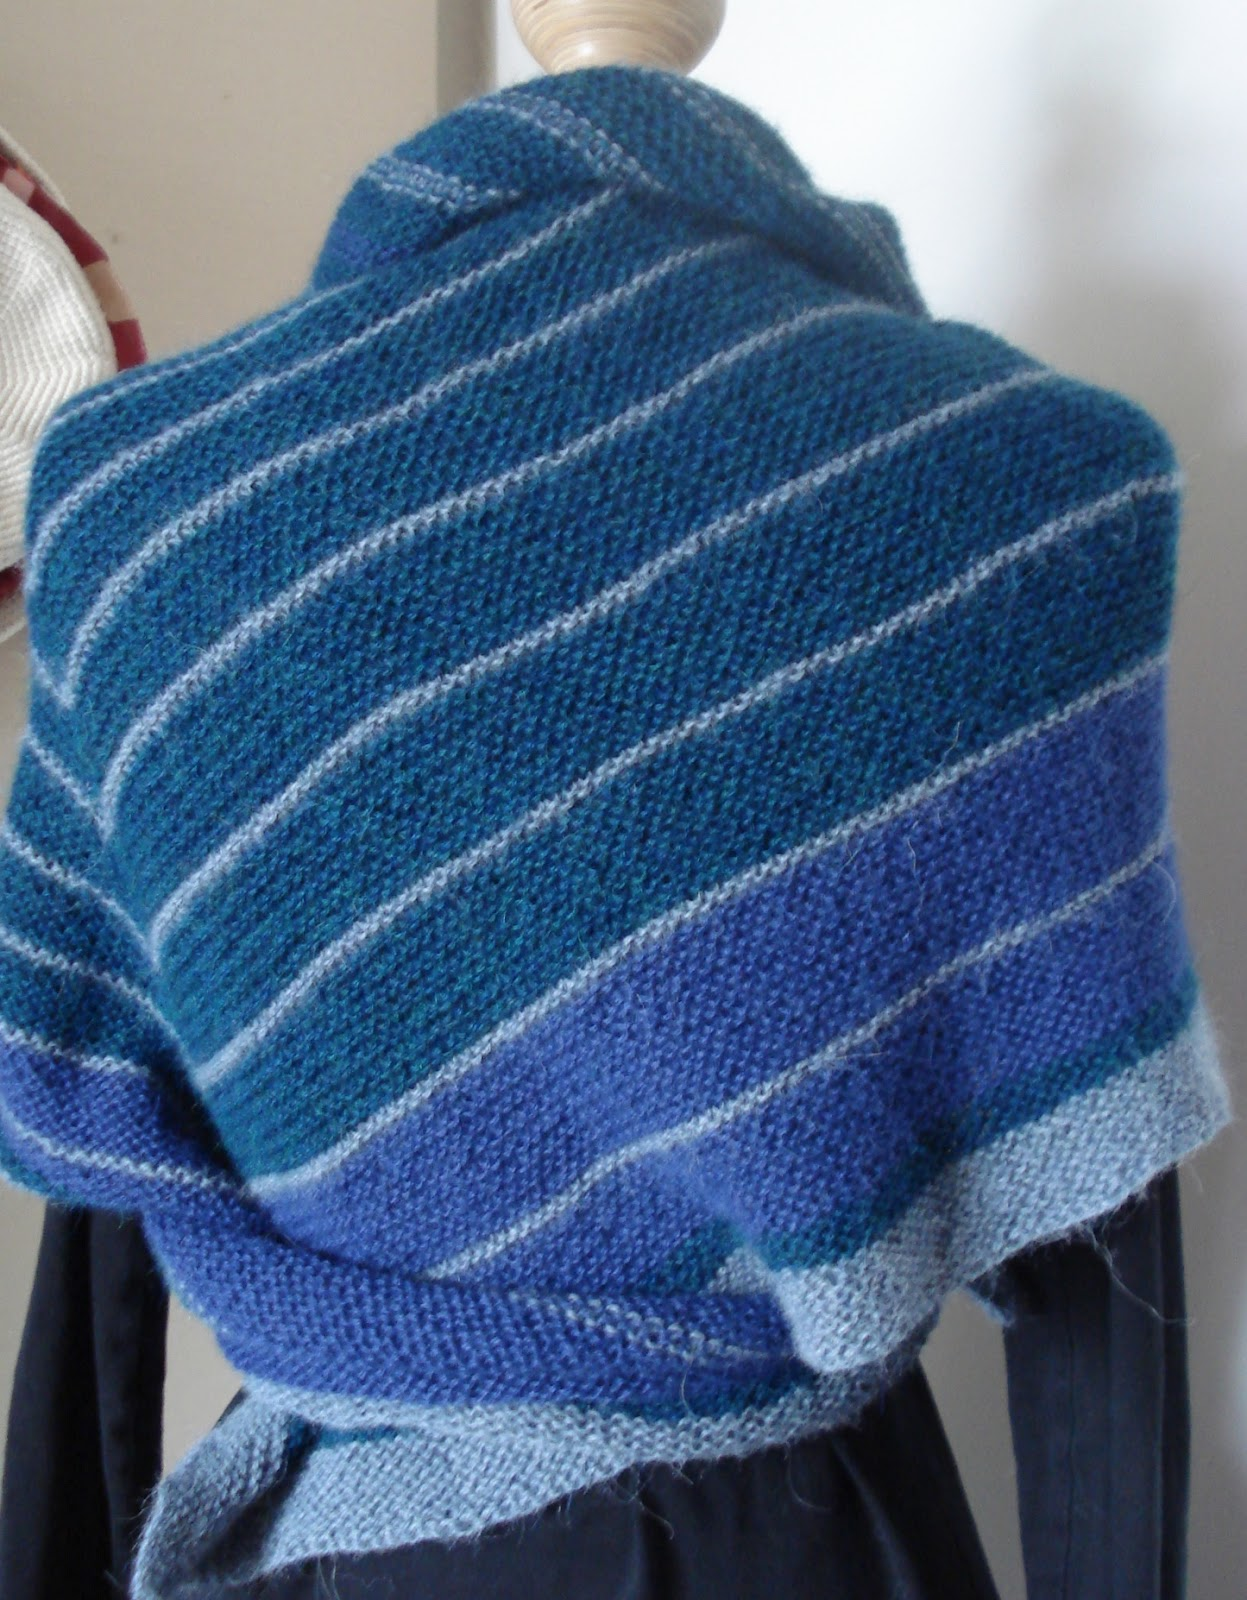 knit forwards understand backwards la la la la droguerie paris. Black Bedroom Furniture Sets. Home Design Ideas